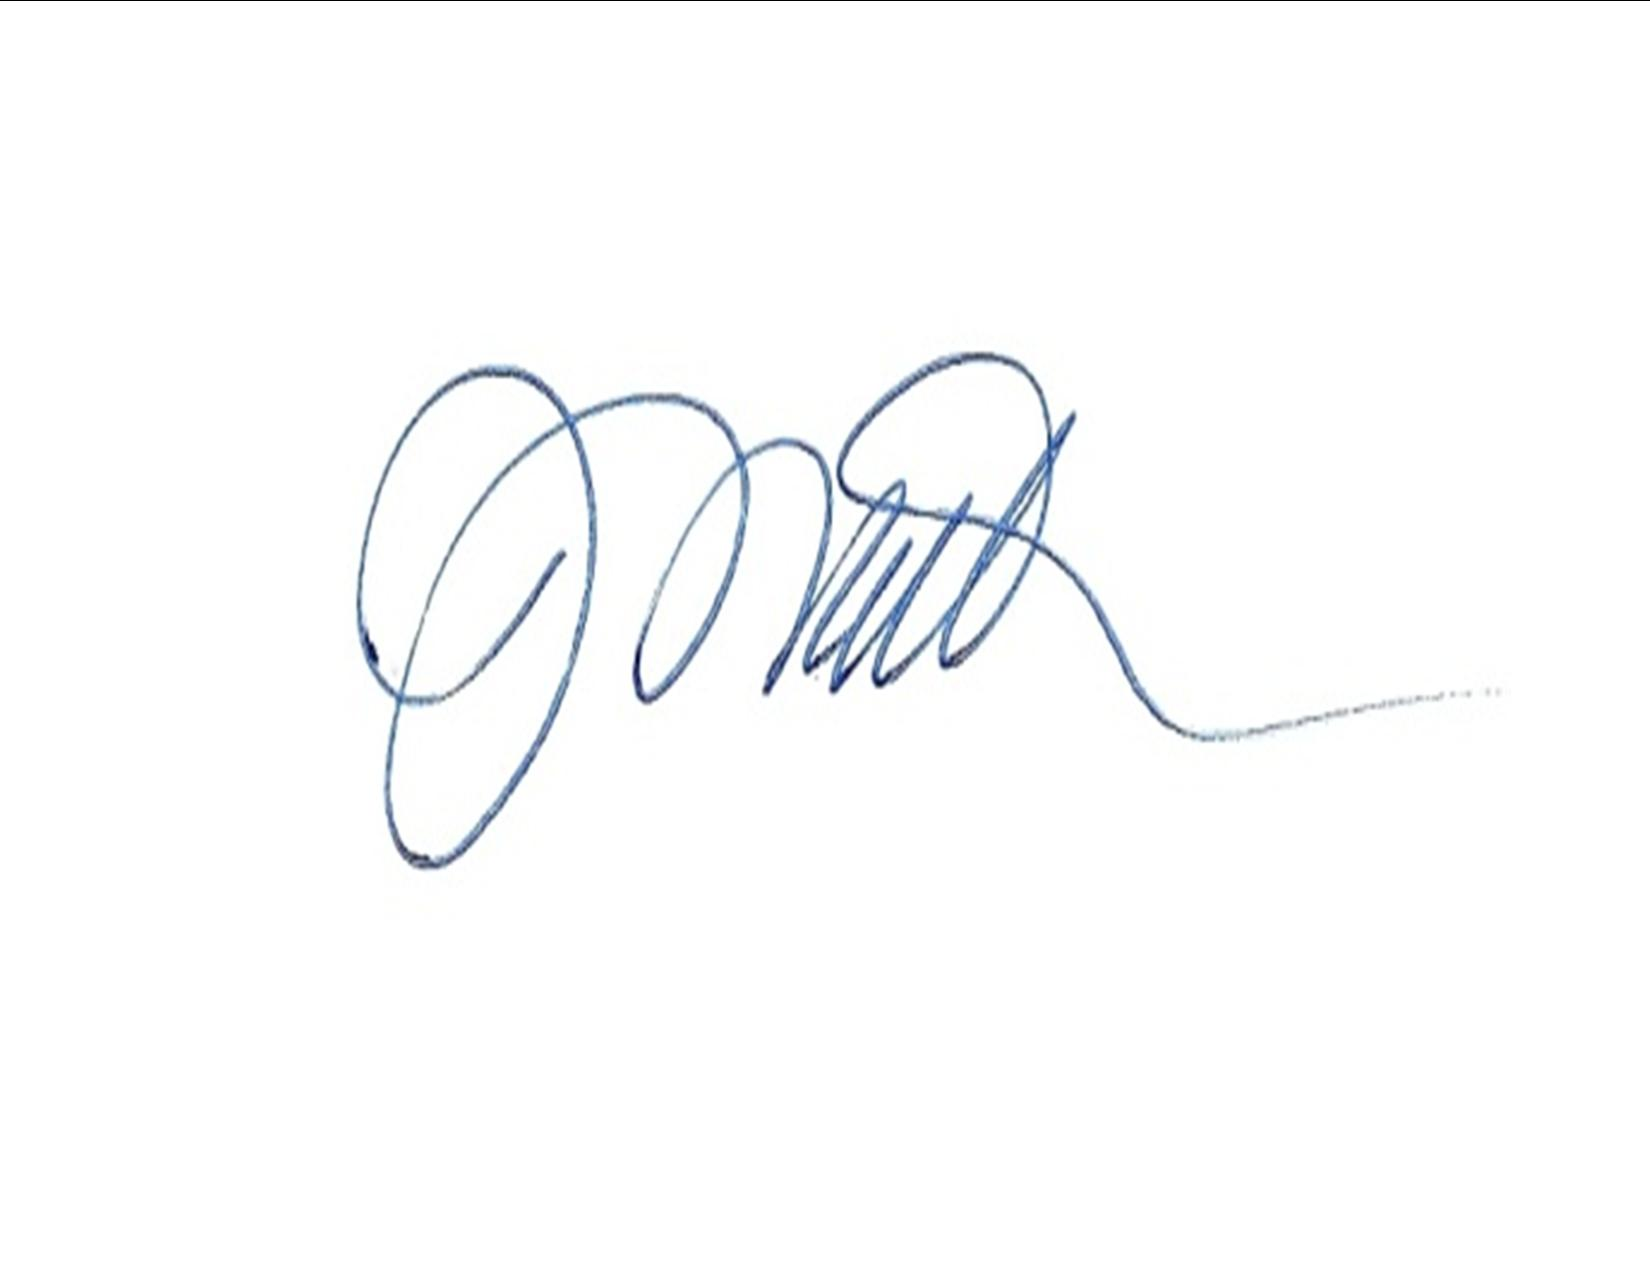 JACK MATTHEWS's Signature